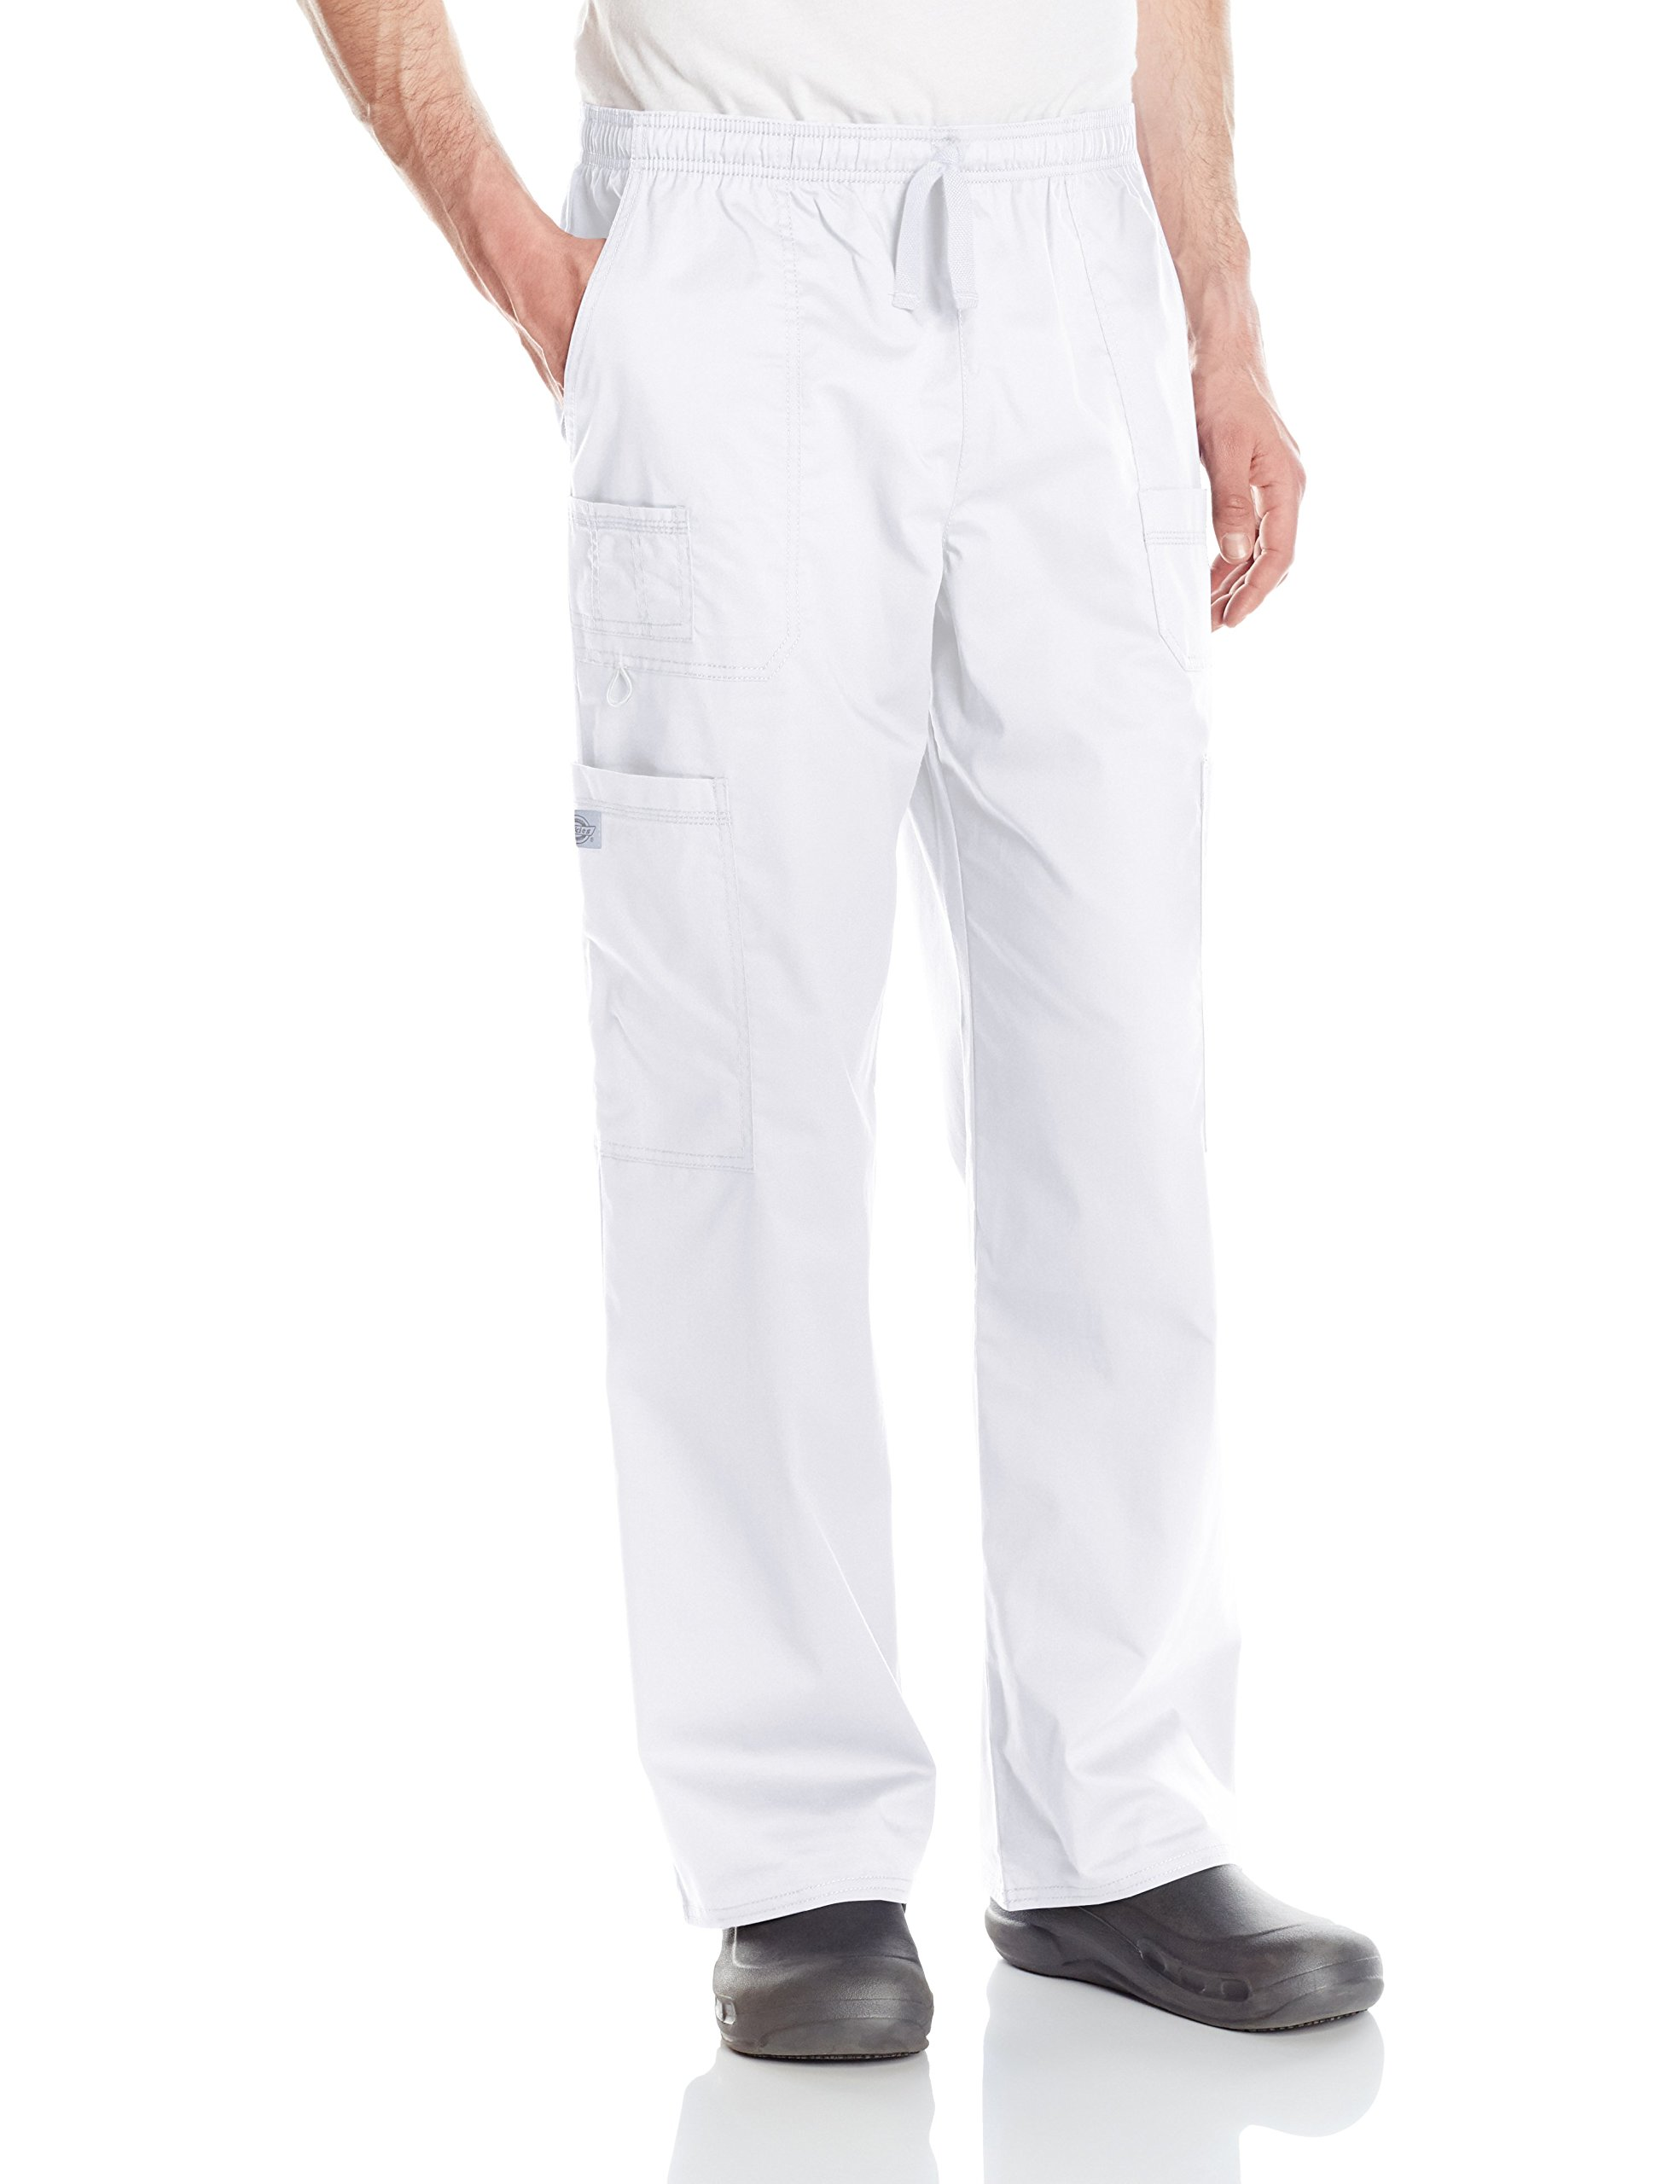 Dickies Men's GenFlex Utility Drawstring Cargo Scrubs Pant, White, X-Large by Dickies